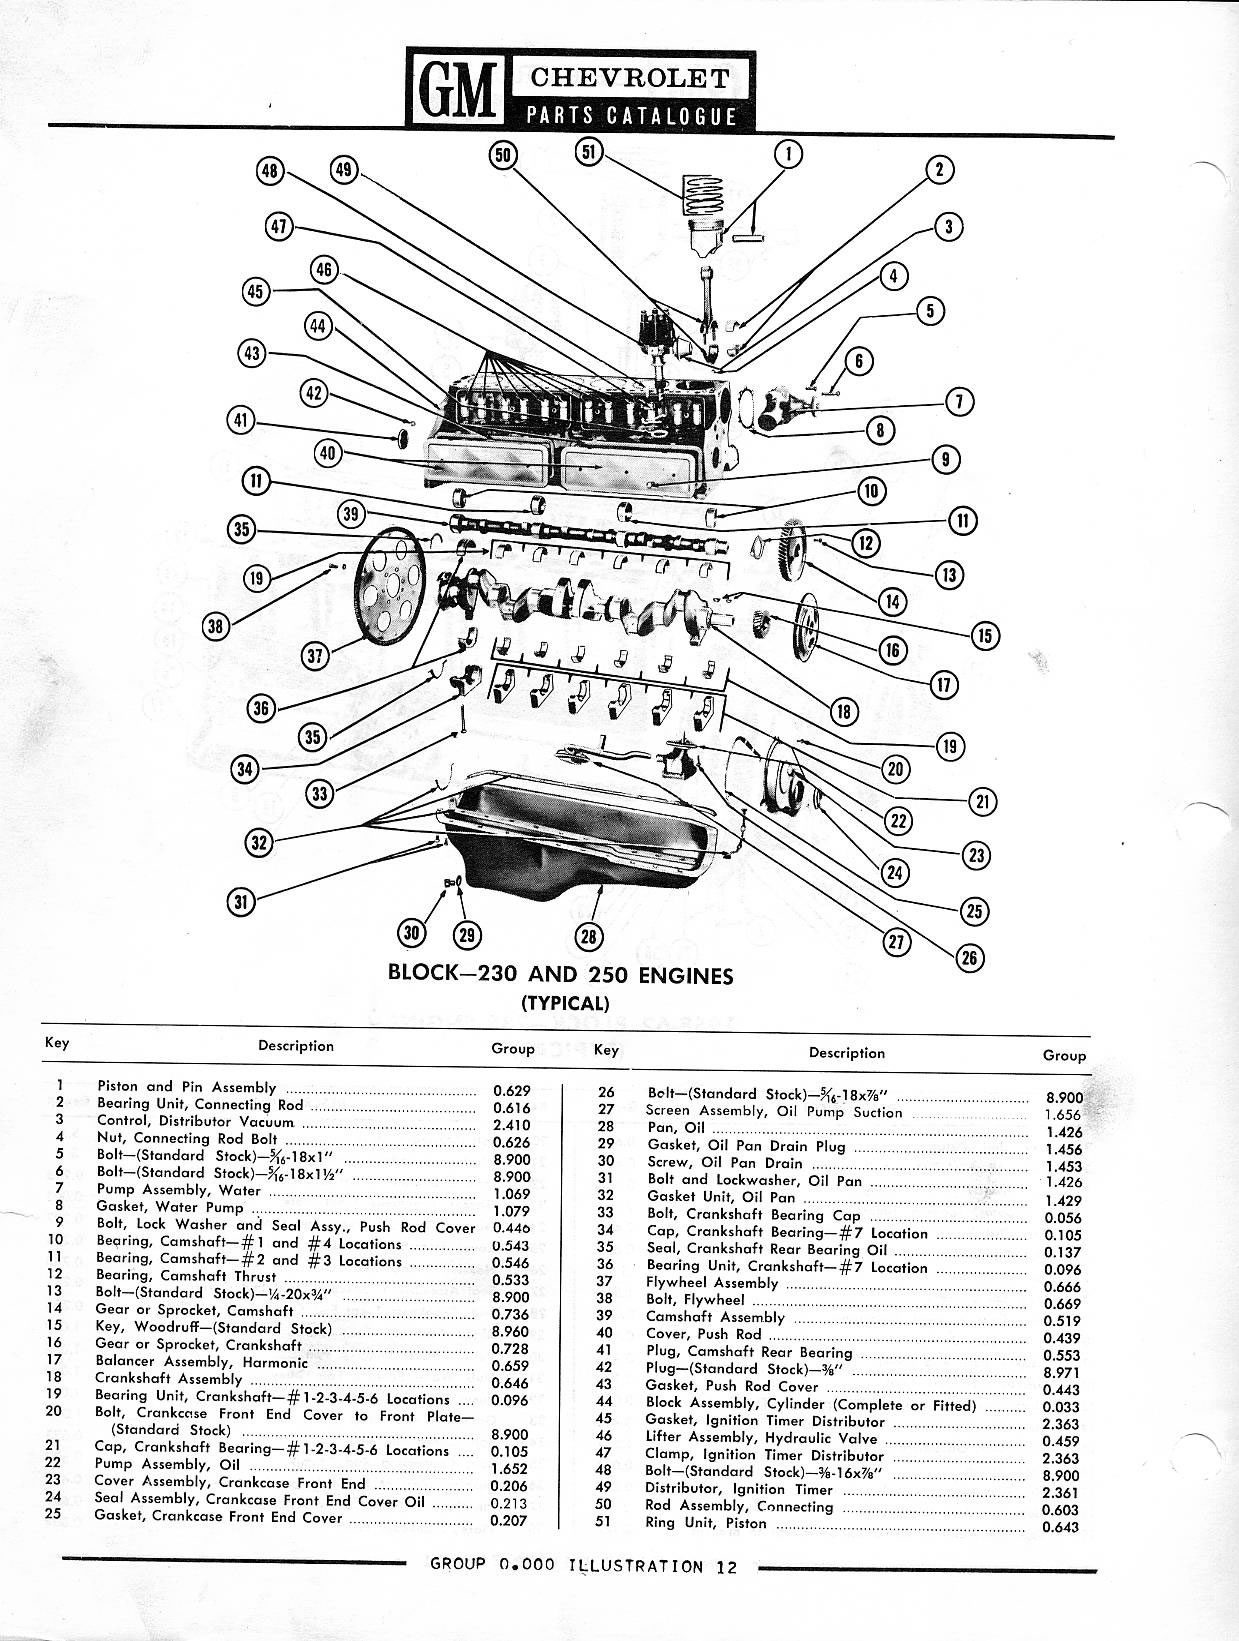 1958-1968 Chevrolet Parts Catalog / Image127.jpg